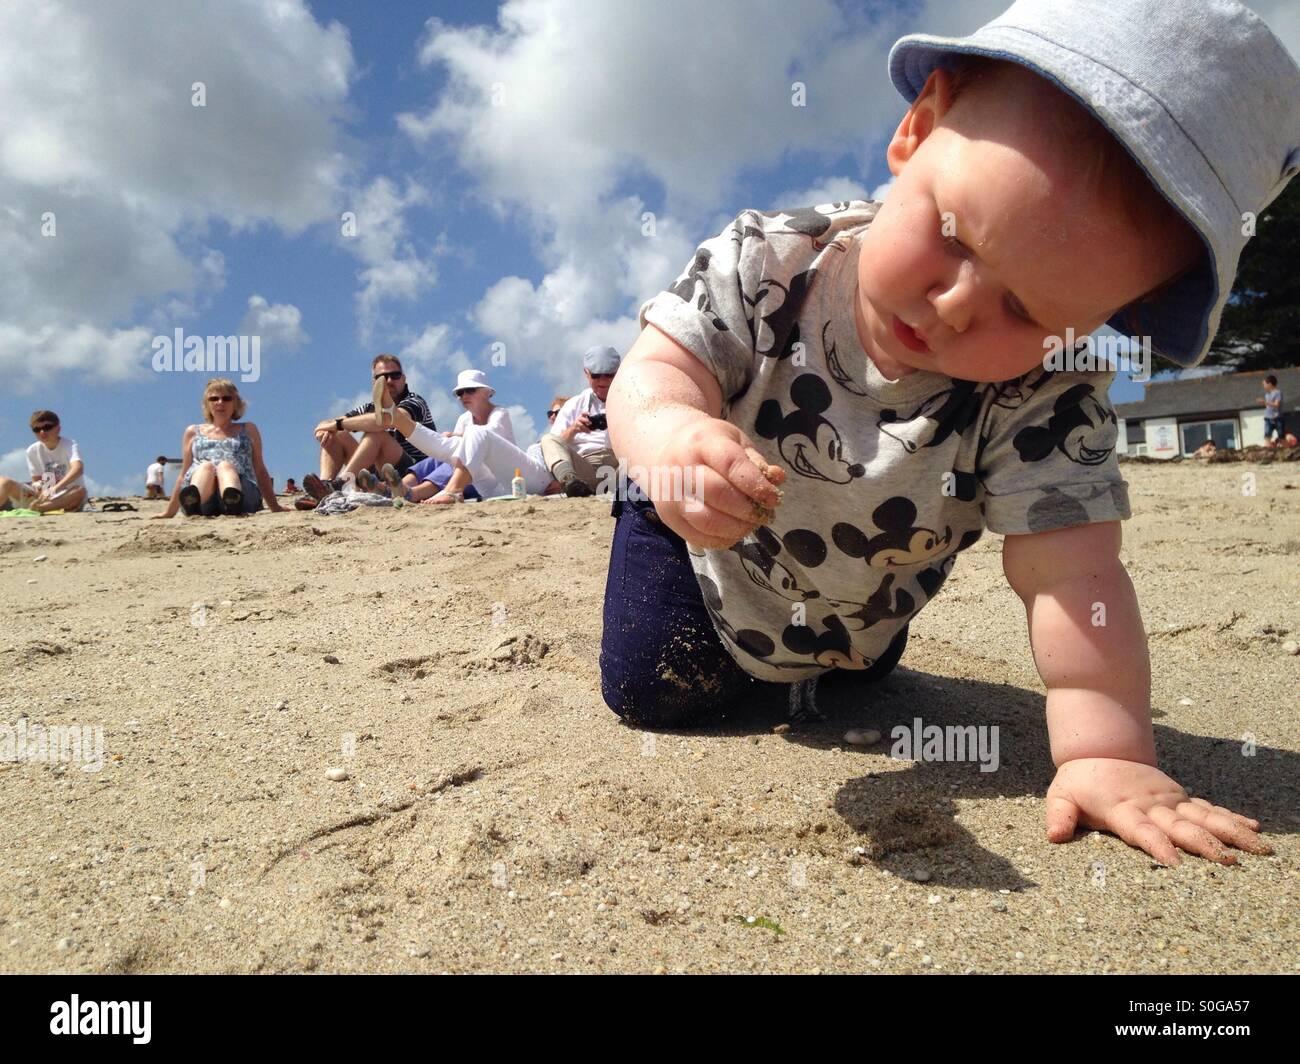 Estudio de la arena con la familia viendo Imagen De Stock